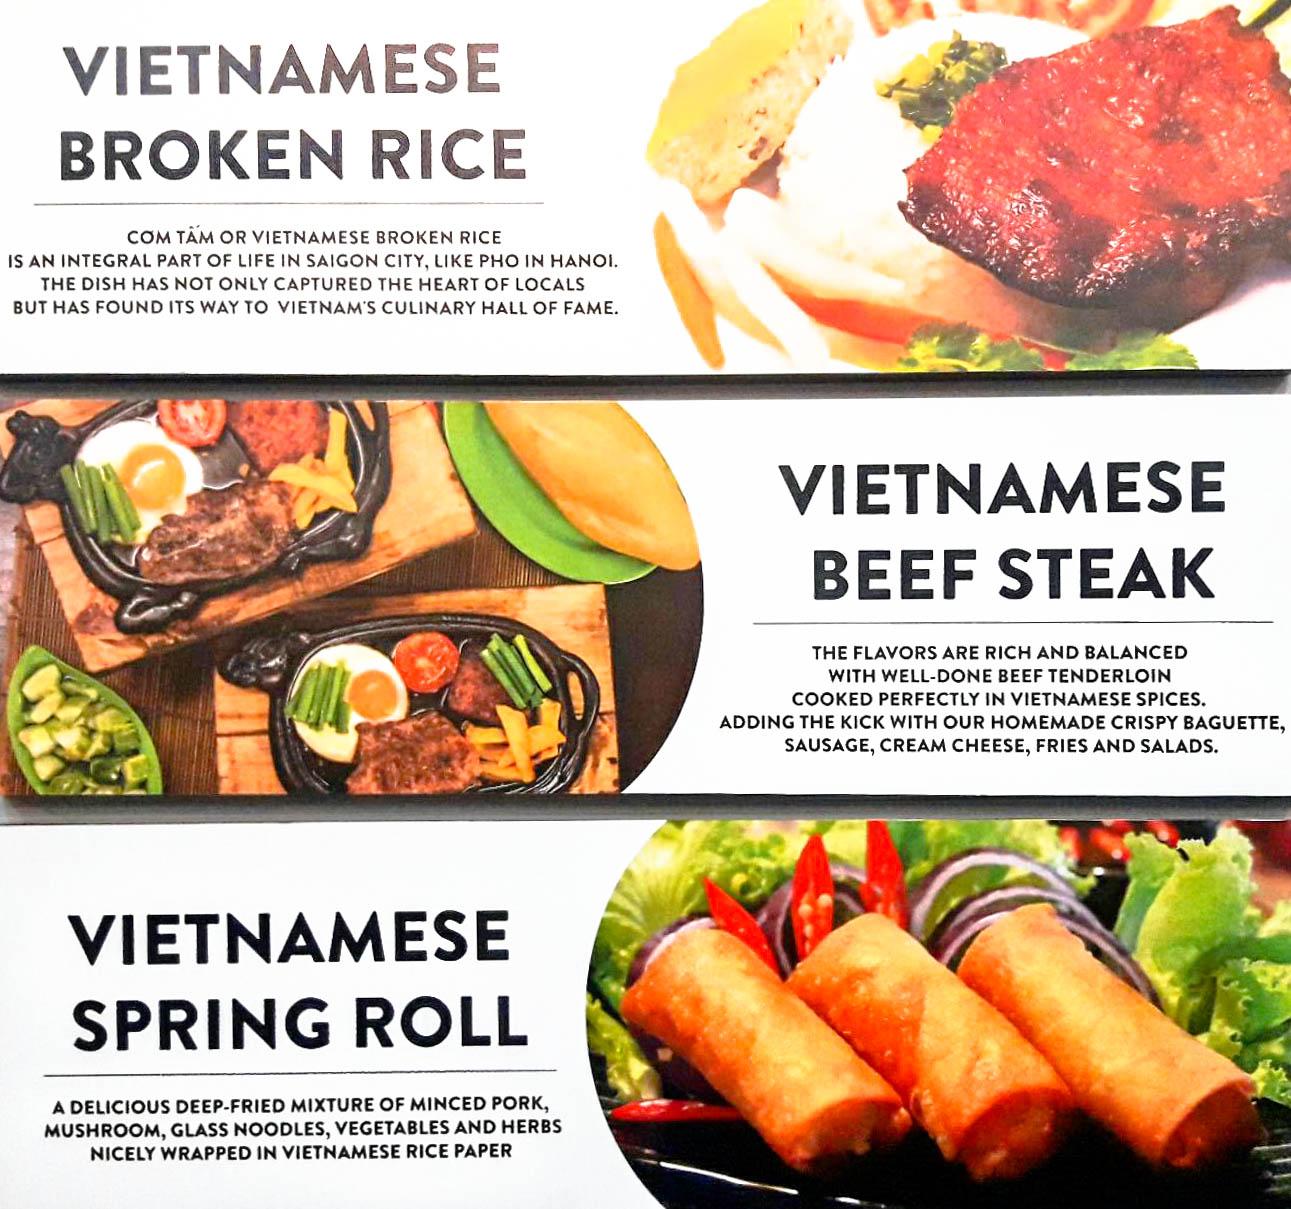 Dalat authentic vietnamese cuisine appetizing adventure for Authentic vietnamese cuisine